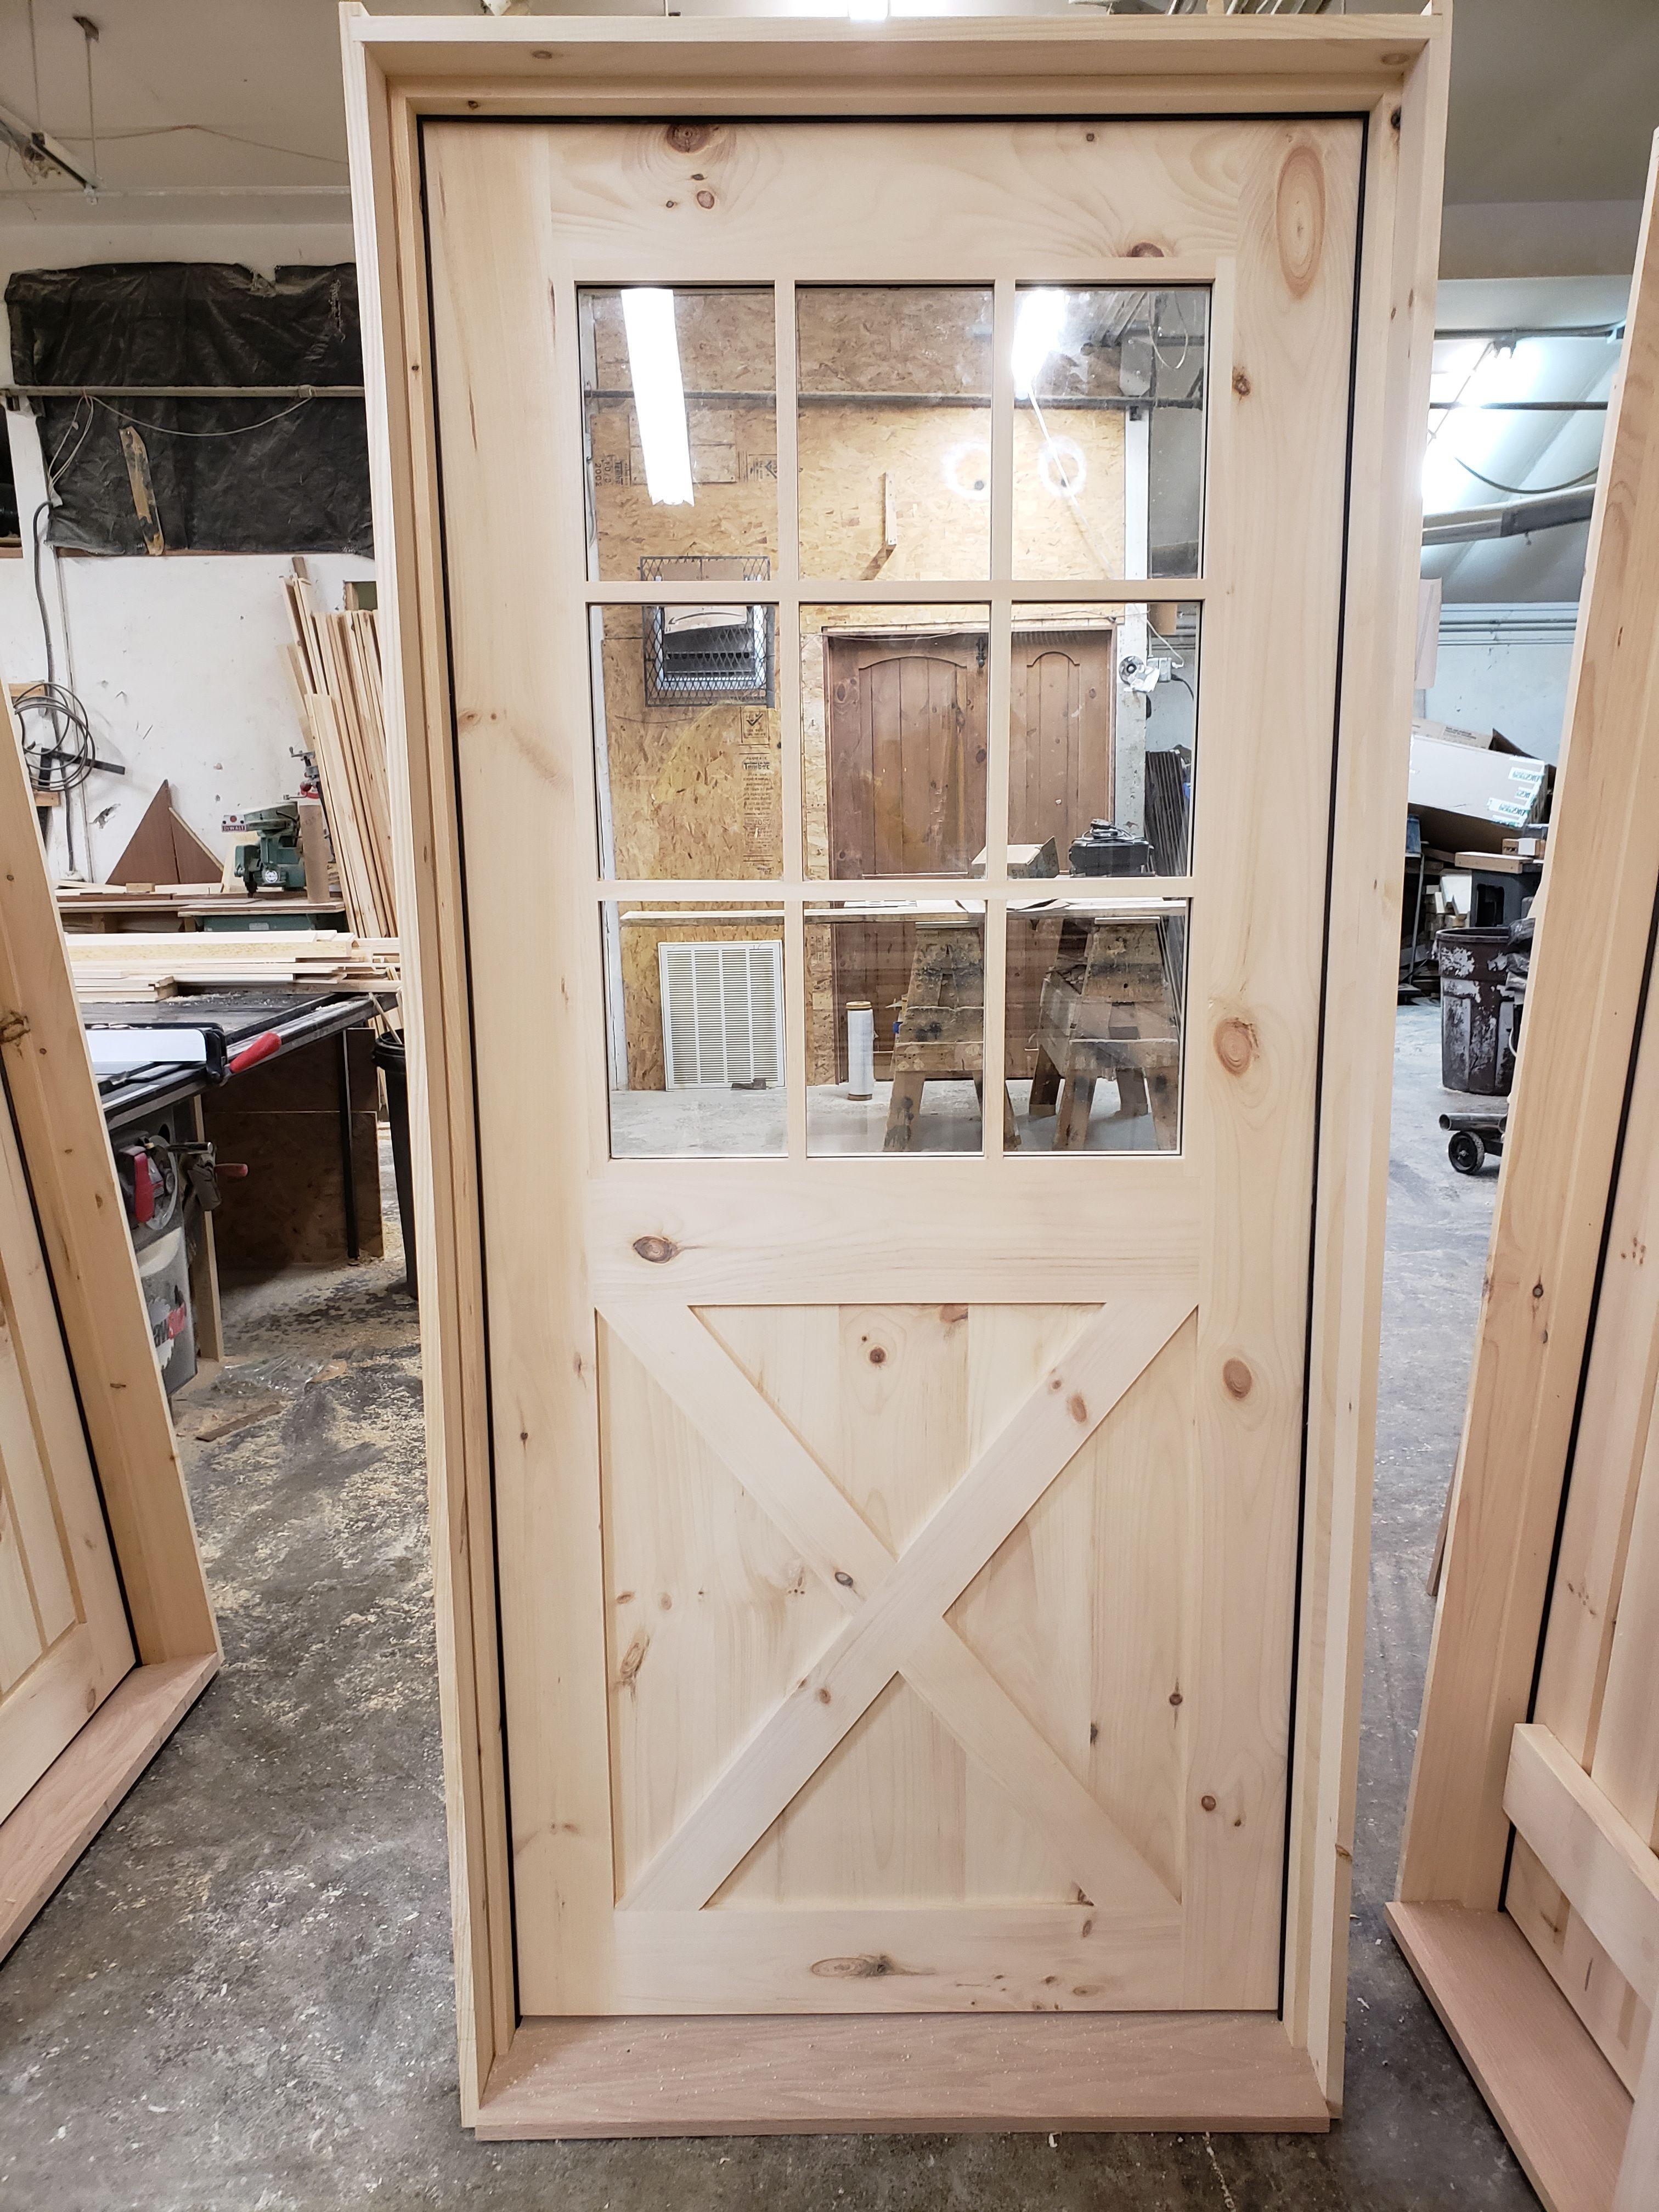 Exterior 9 Lite Pine Door With Decorative Cross Buck Call Today For A Free Quote 518 745 4066 Or Visit Our Websit Farmhouse Doors Custom Wood Doors Pine Doors